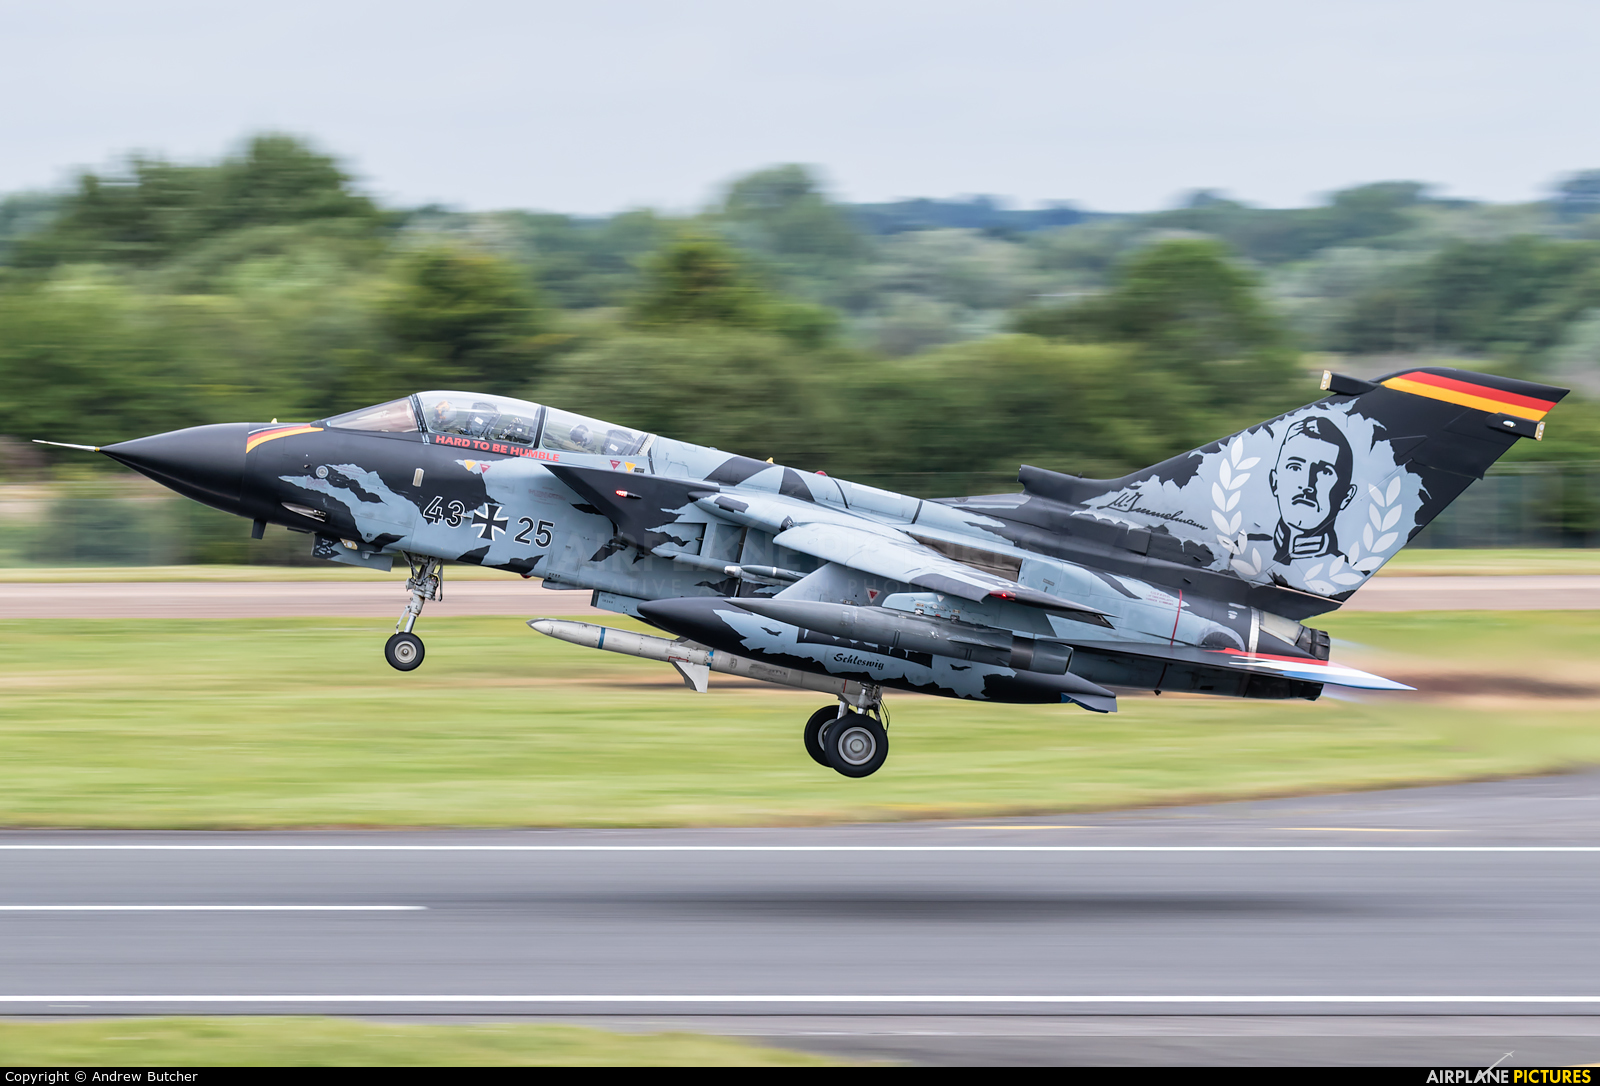 Germany - Air Force 43+25 aircraft at Fairford